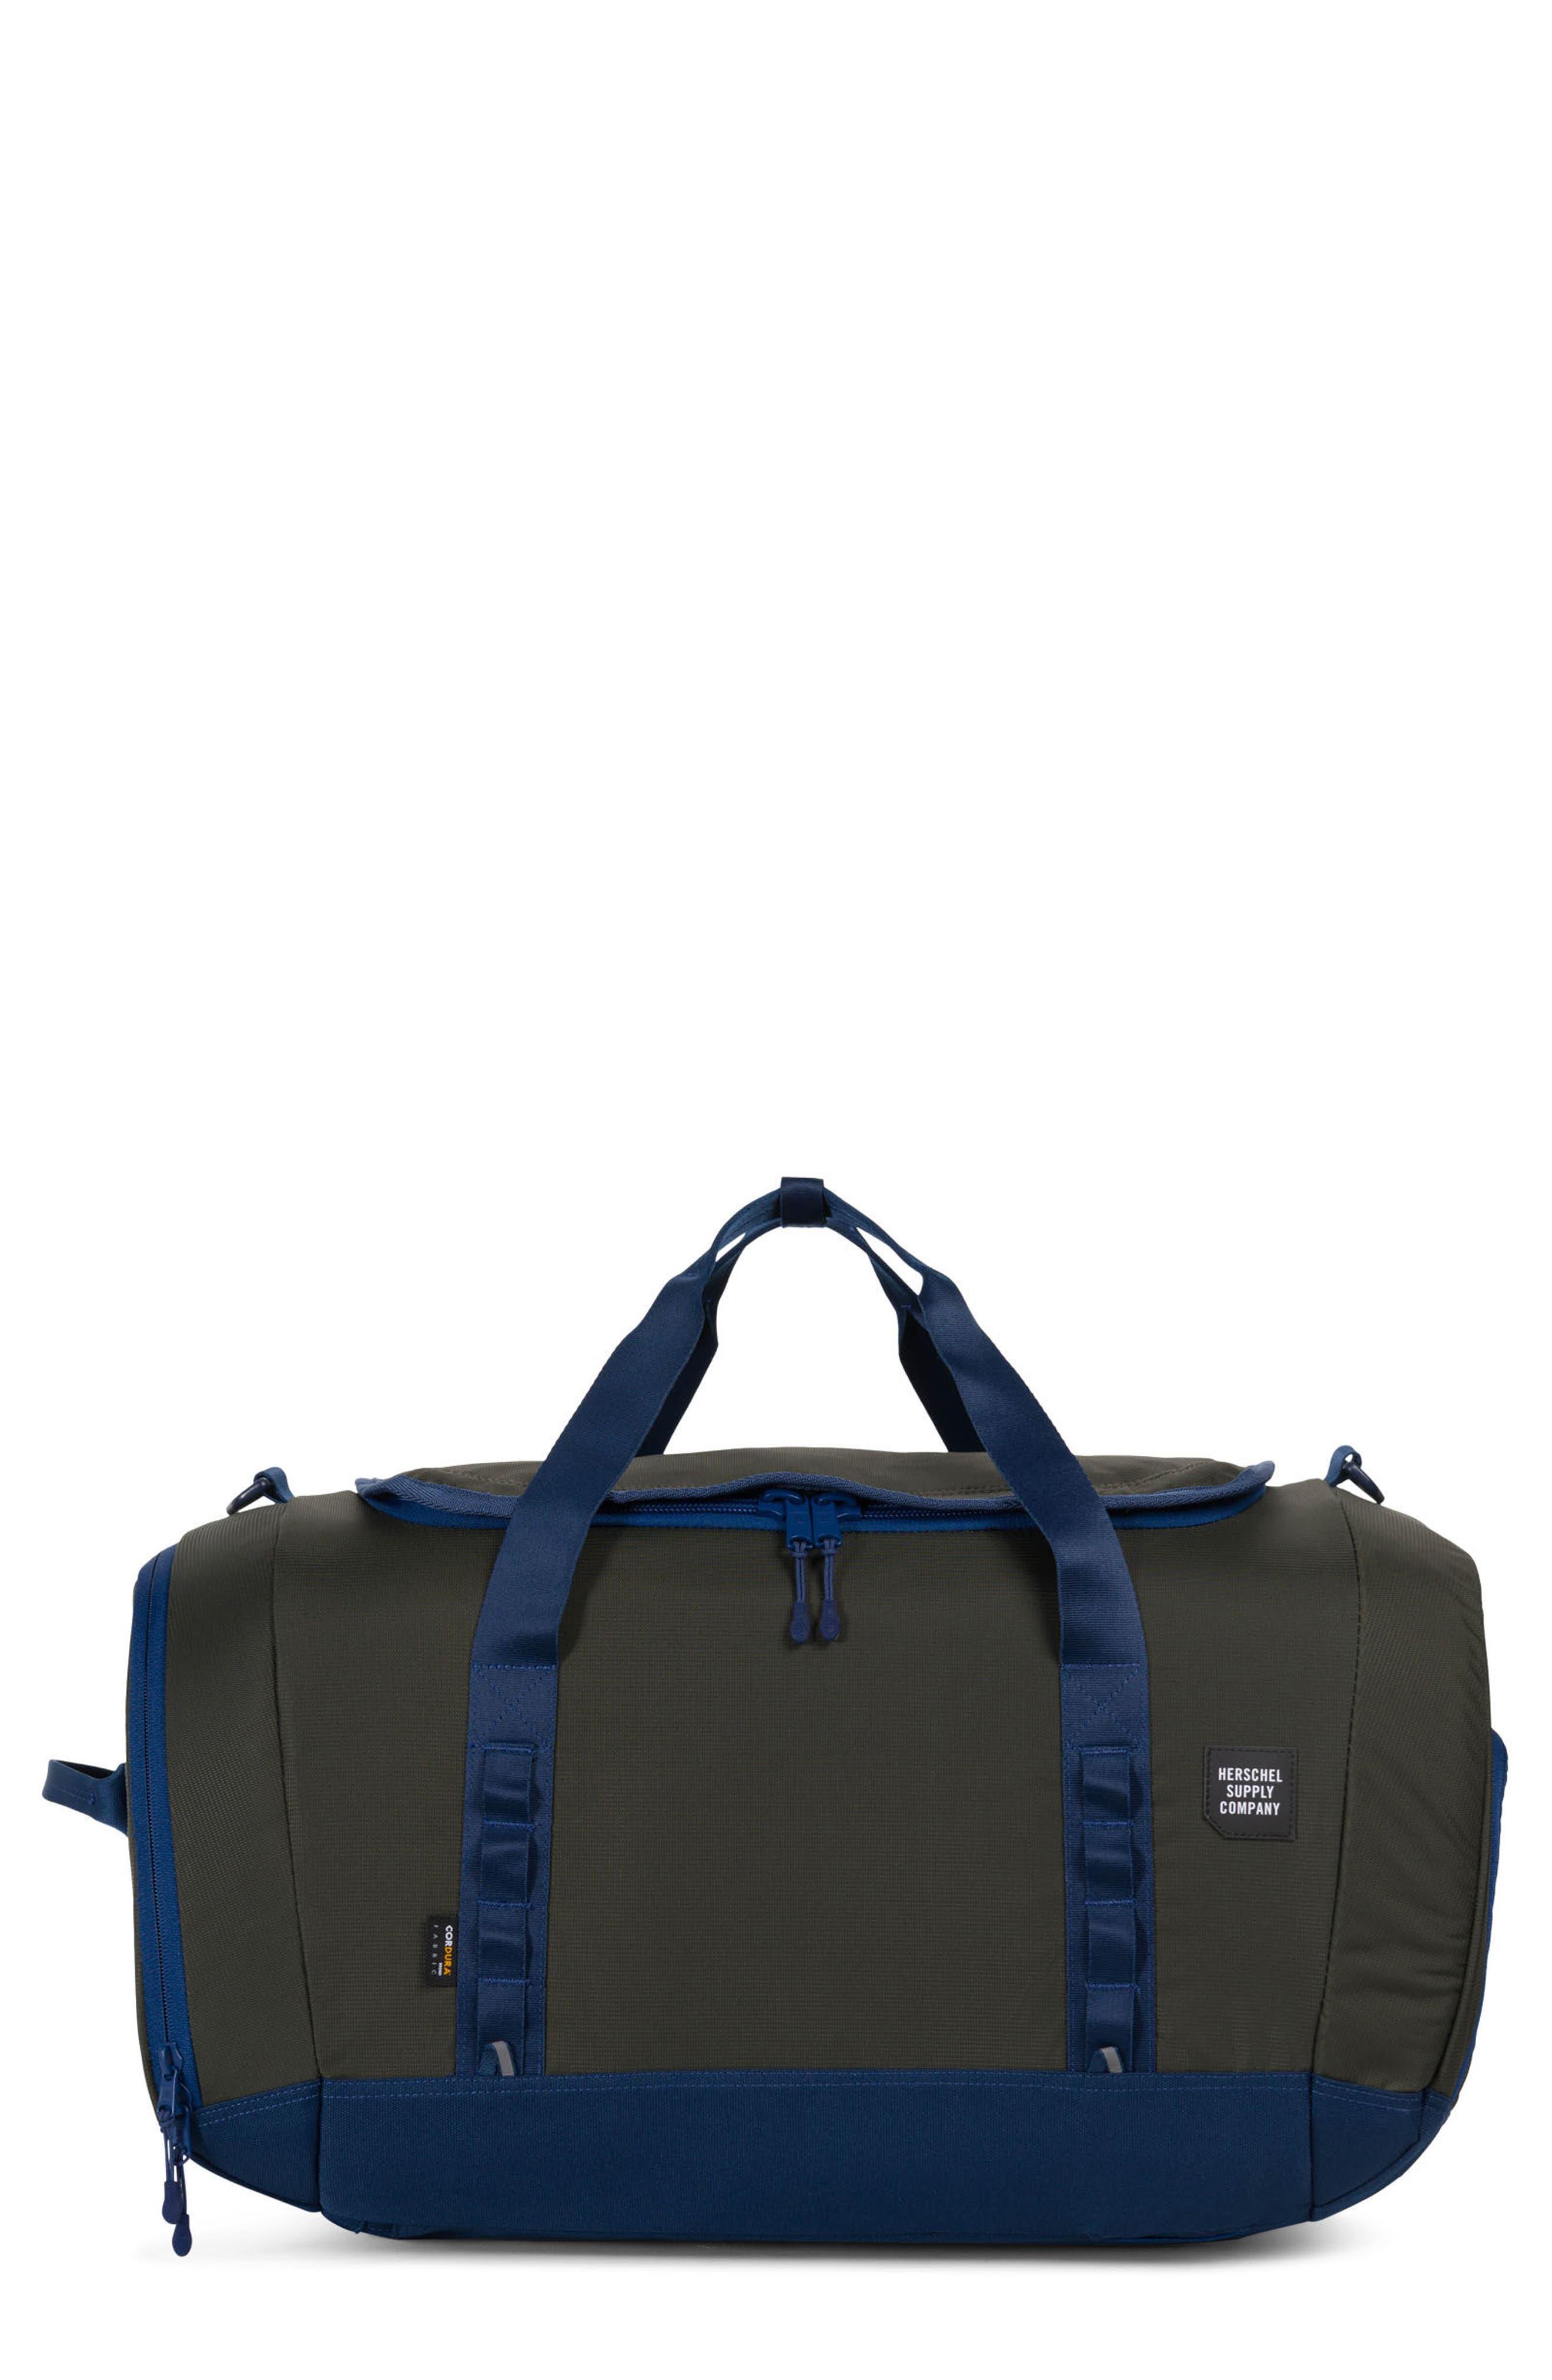 Alternate Image 1 Selected - Herschel Supply Co. Trail Gorge Duffel Bag